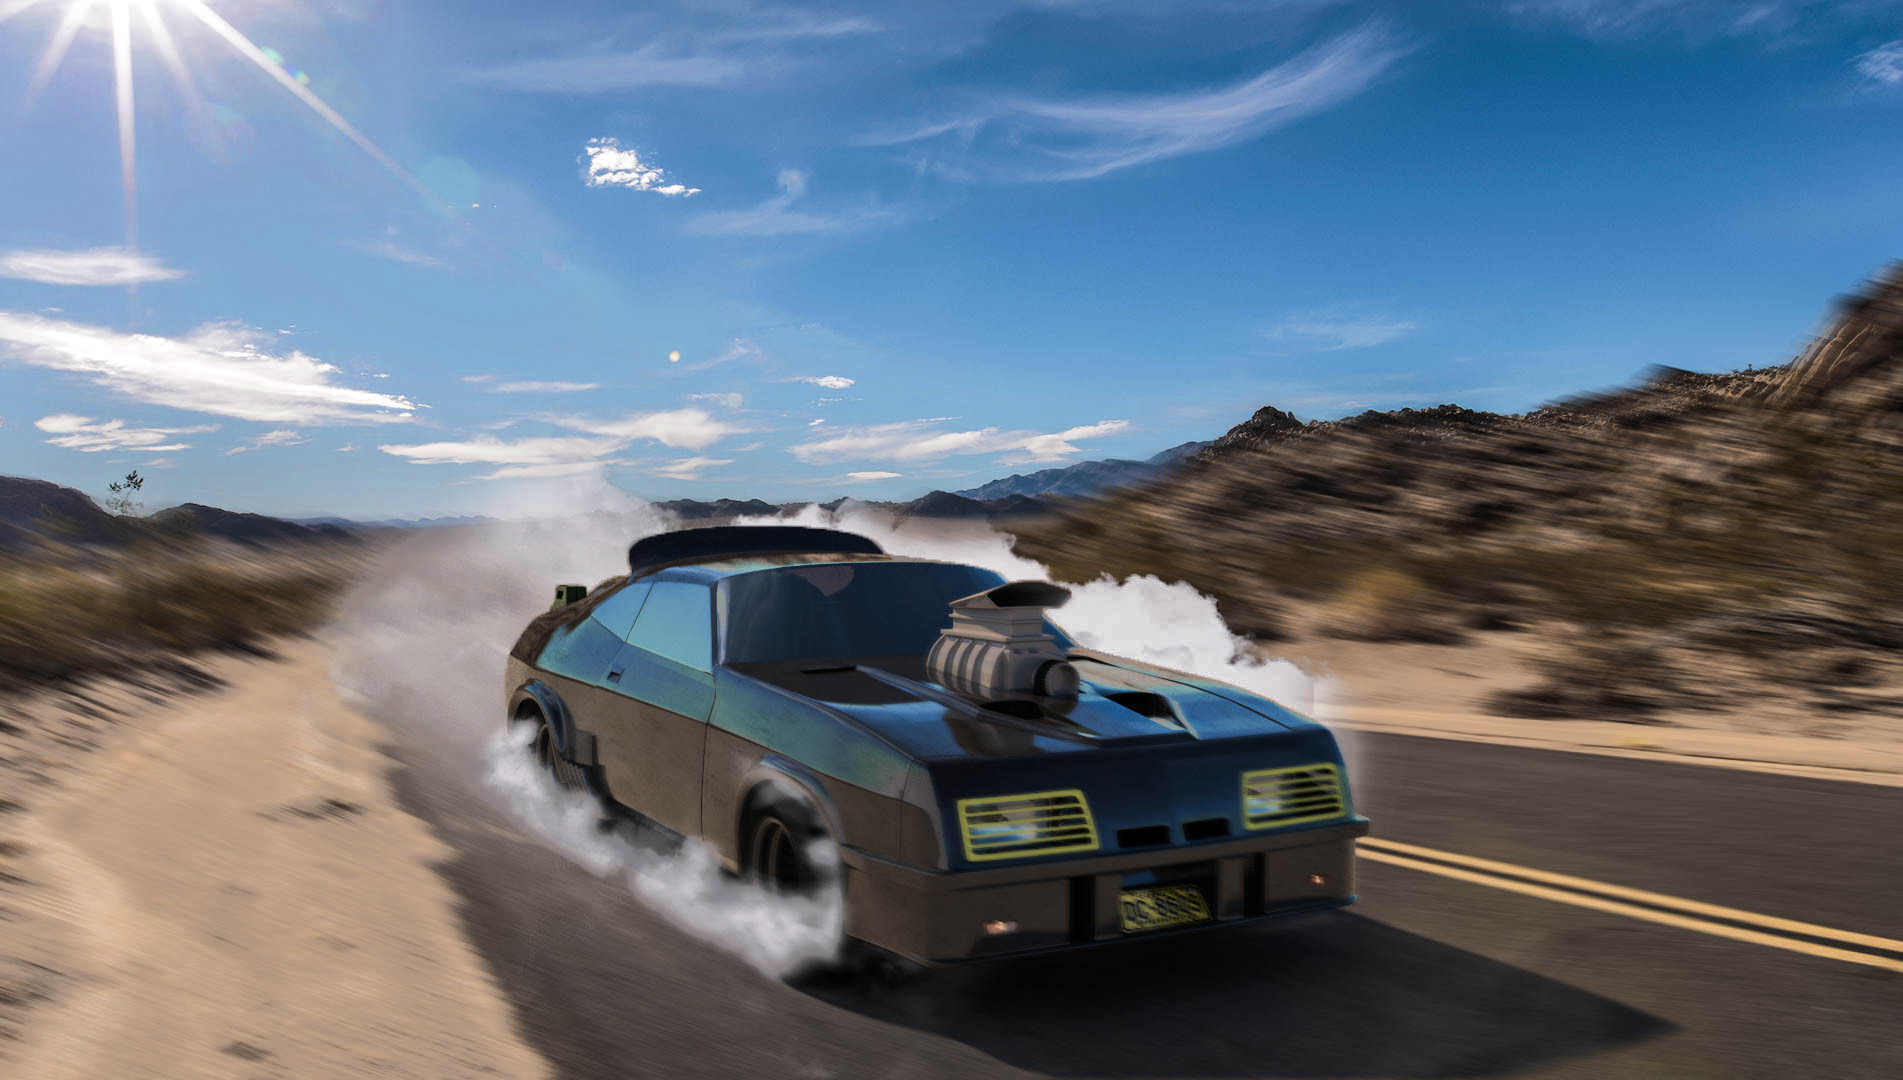 Ford falcon v8 interceptor, Mad Max car. Dimitry tkachev max final3